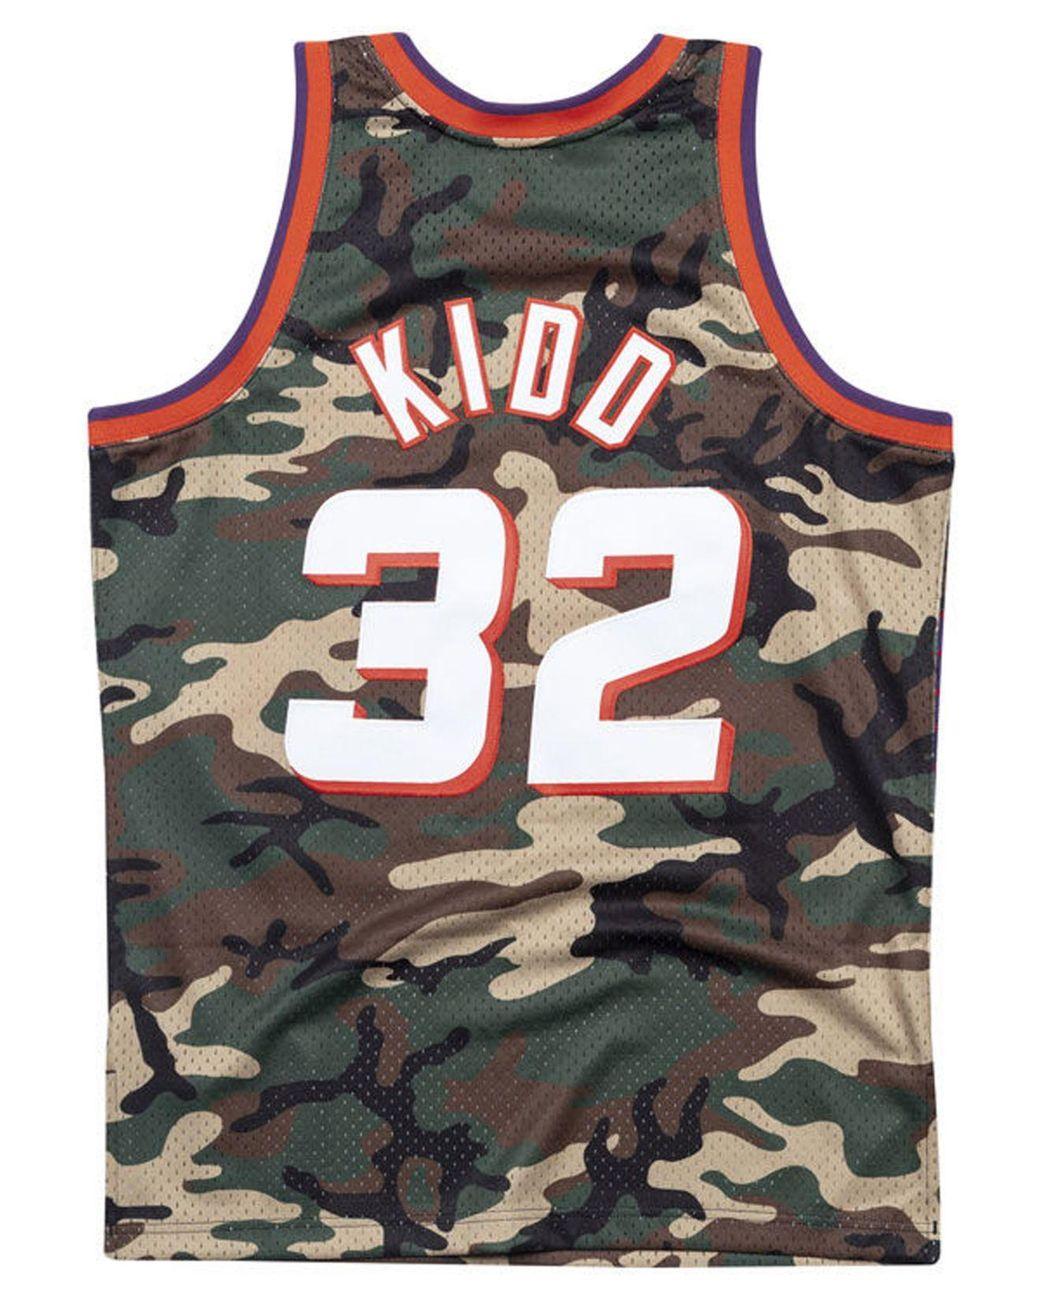 promo code 7672b a08c4 Men's Jersey Jason Kidd Phoenix Suns Woodland Camo Swingman